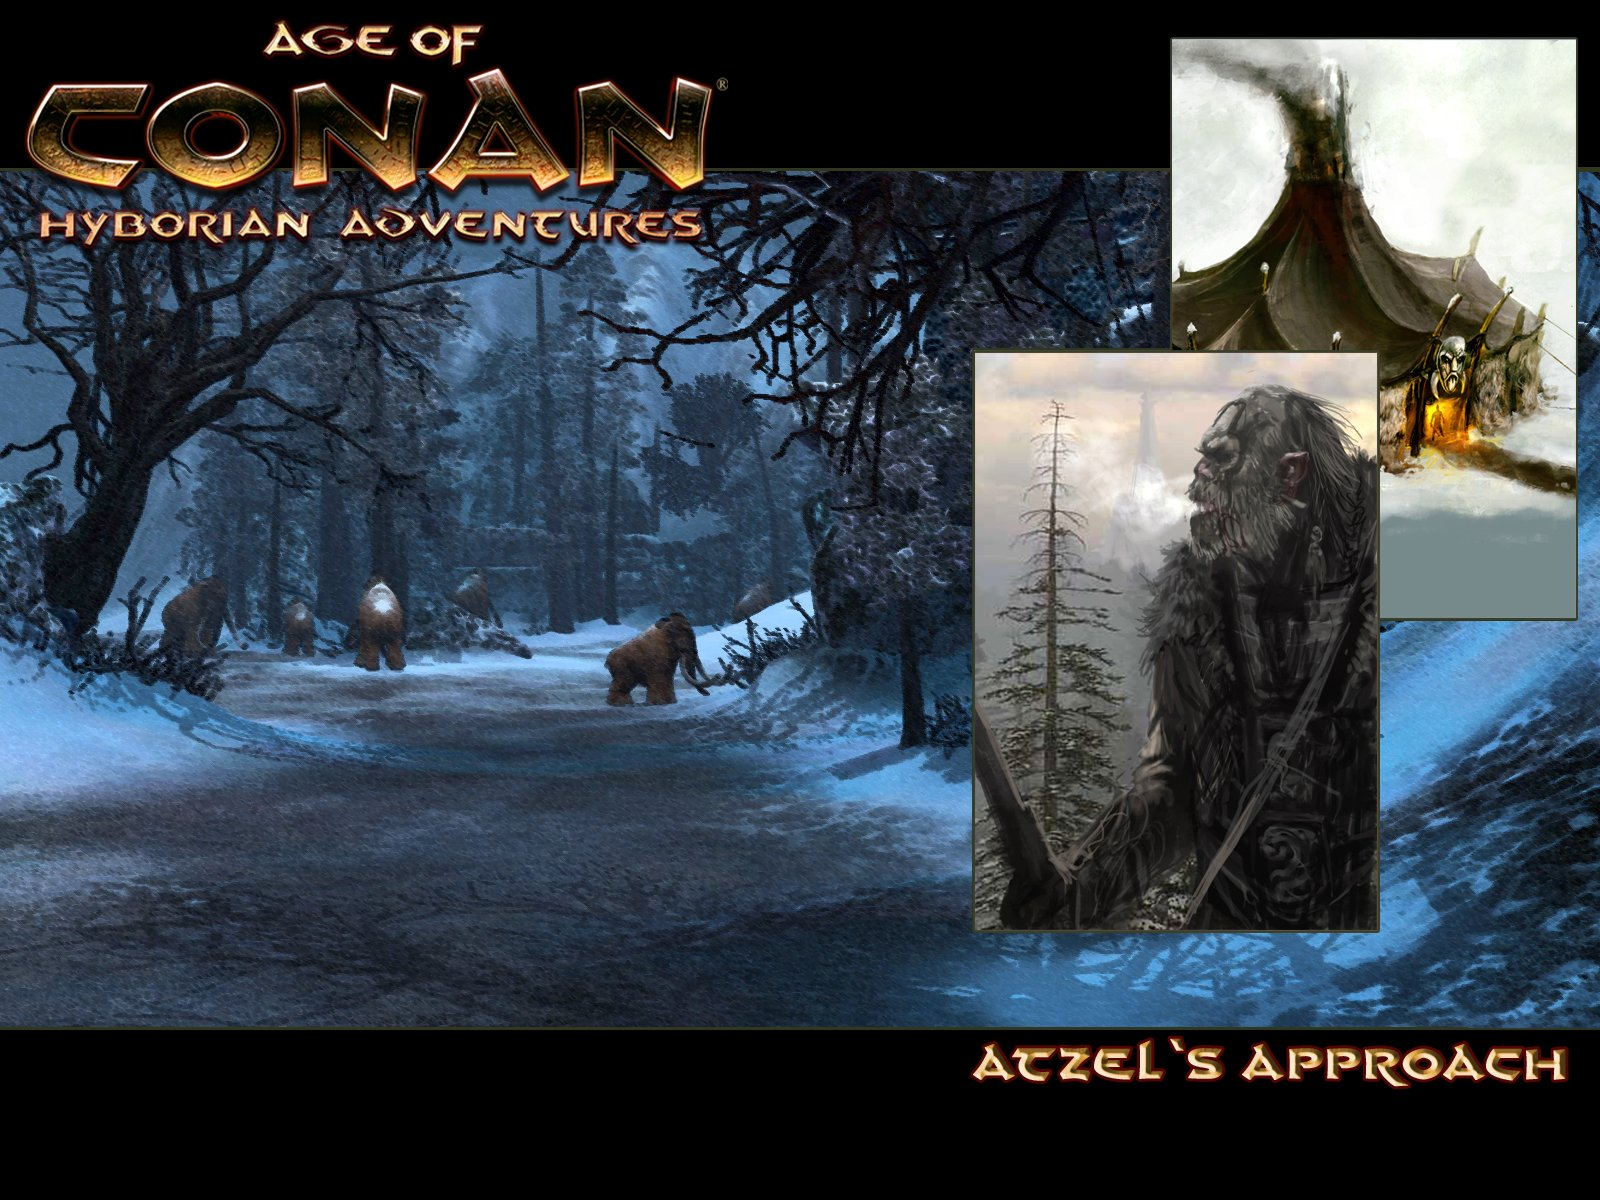 Age of Conan wallpaper 2